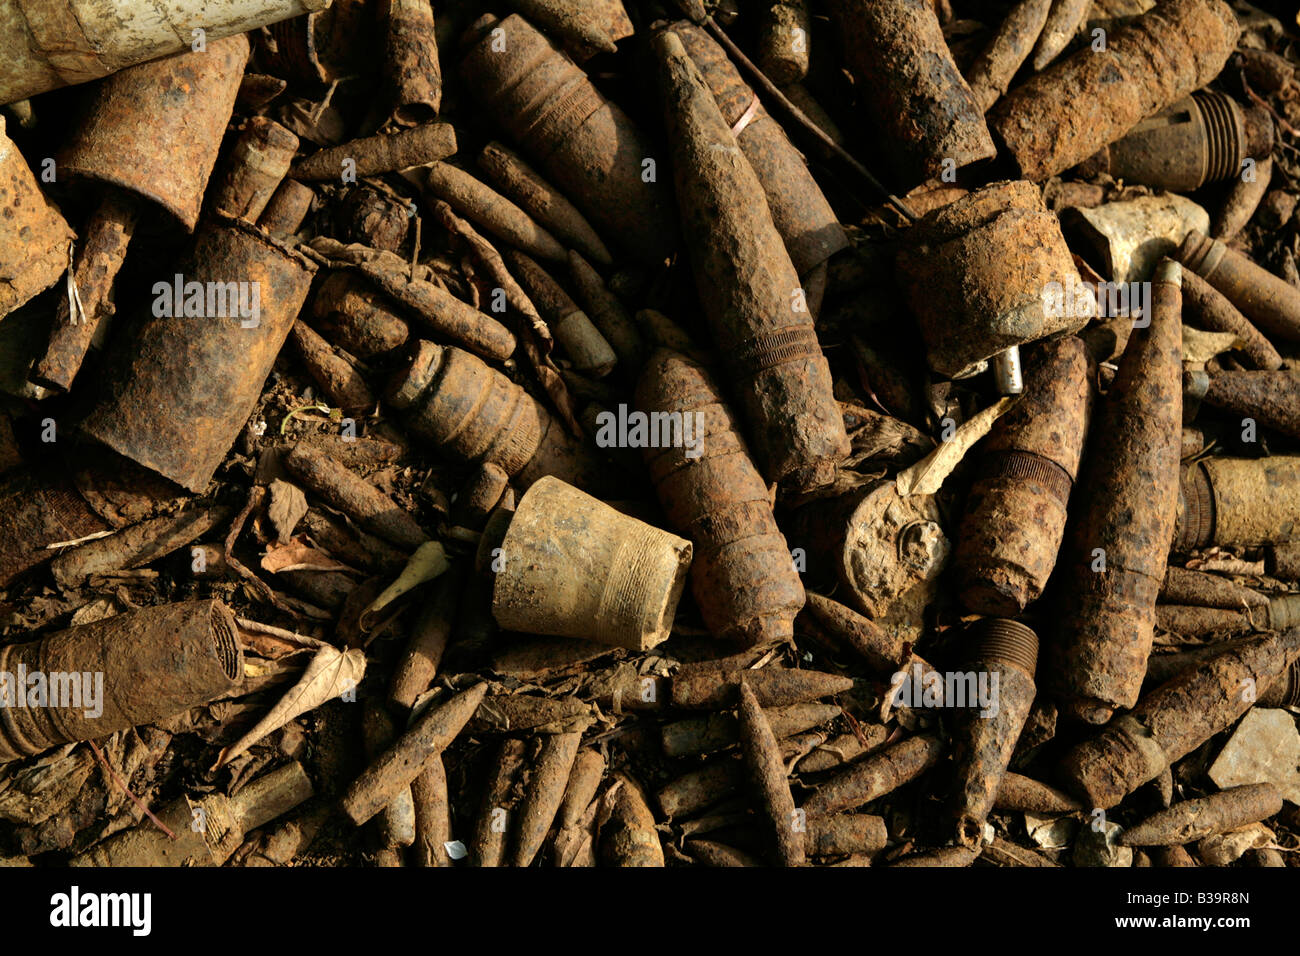 Nong Het  district, Xieng Khouang  Live munitions lie in a dangerous pile in the front driveway of a scrap dealer's - Stock Image